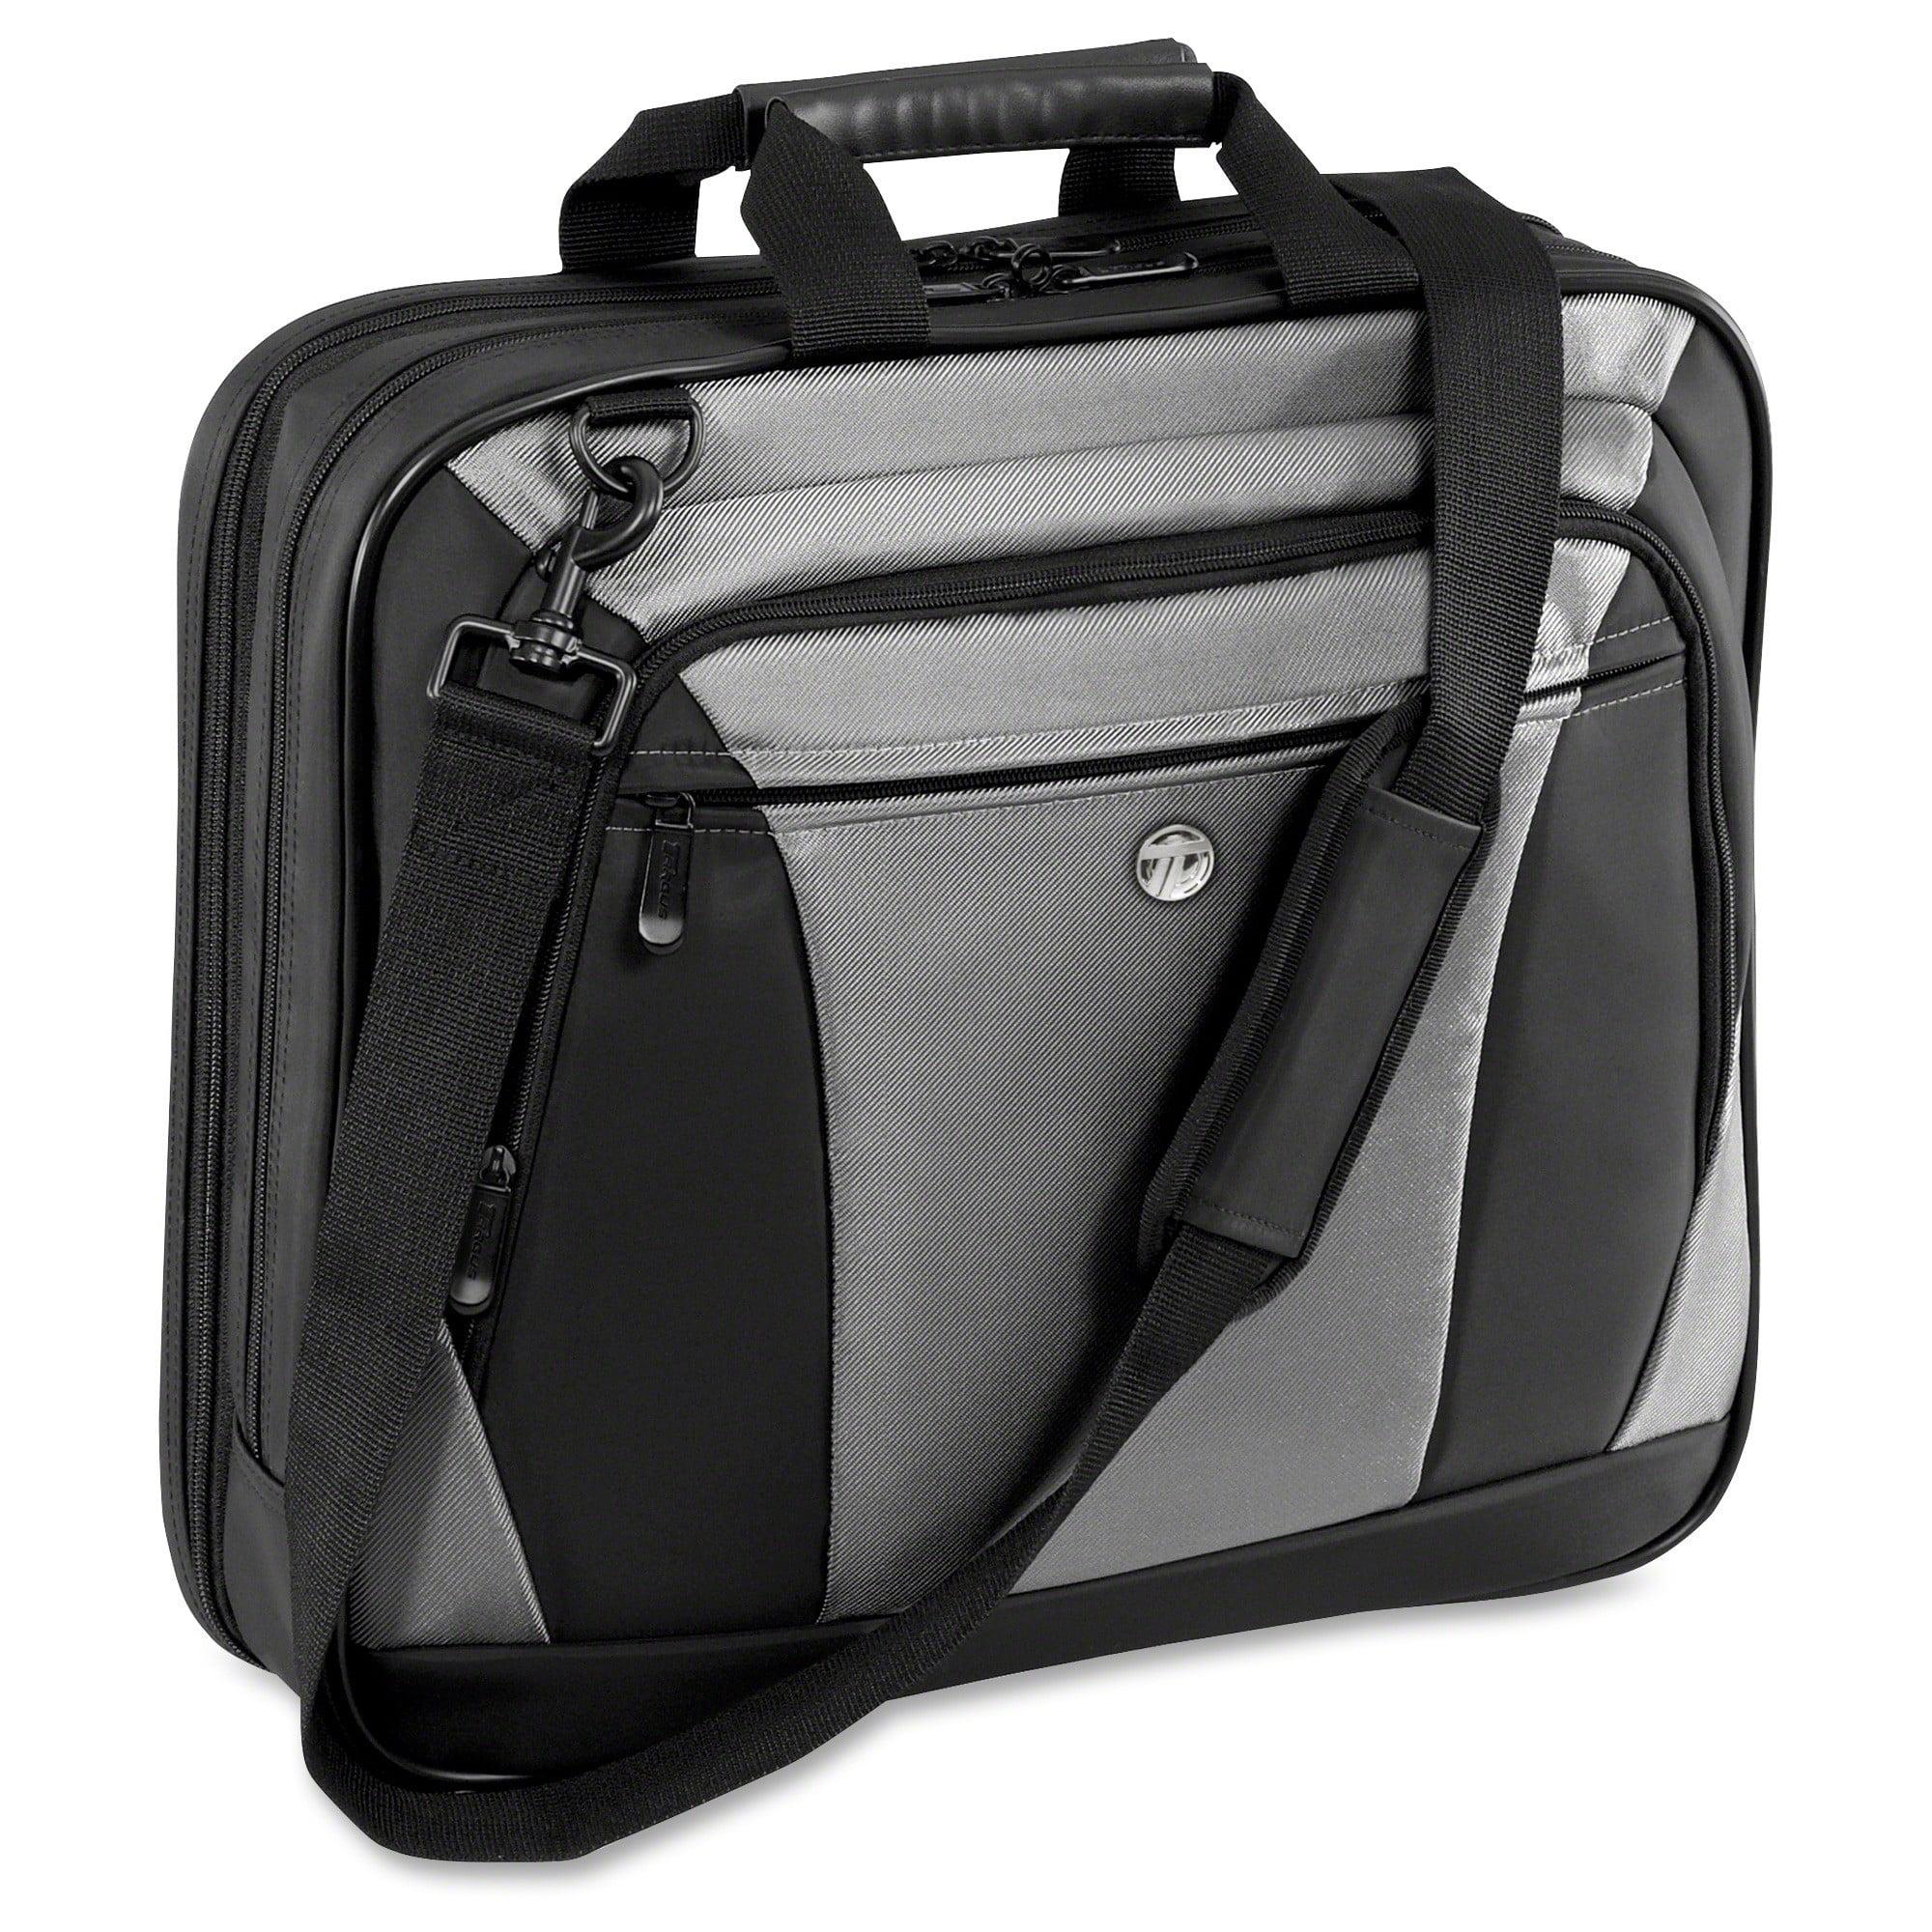 "Targus CityLite TBT050US 16"" Notebook Case - Nylon - 13.5"" Height (Refurbished)"